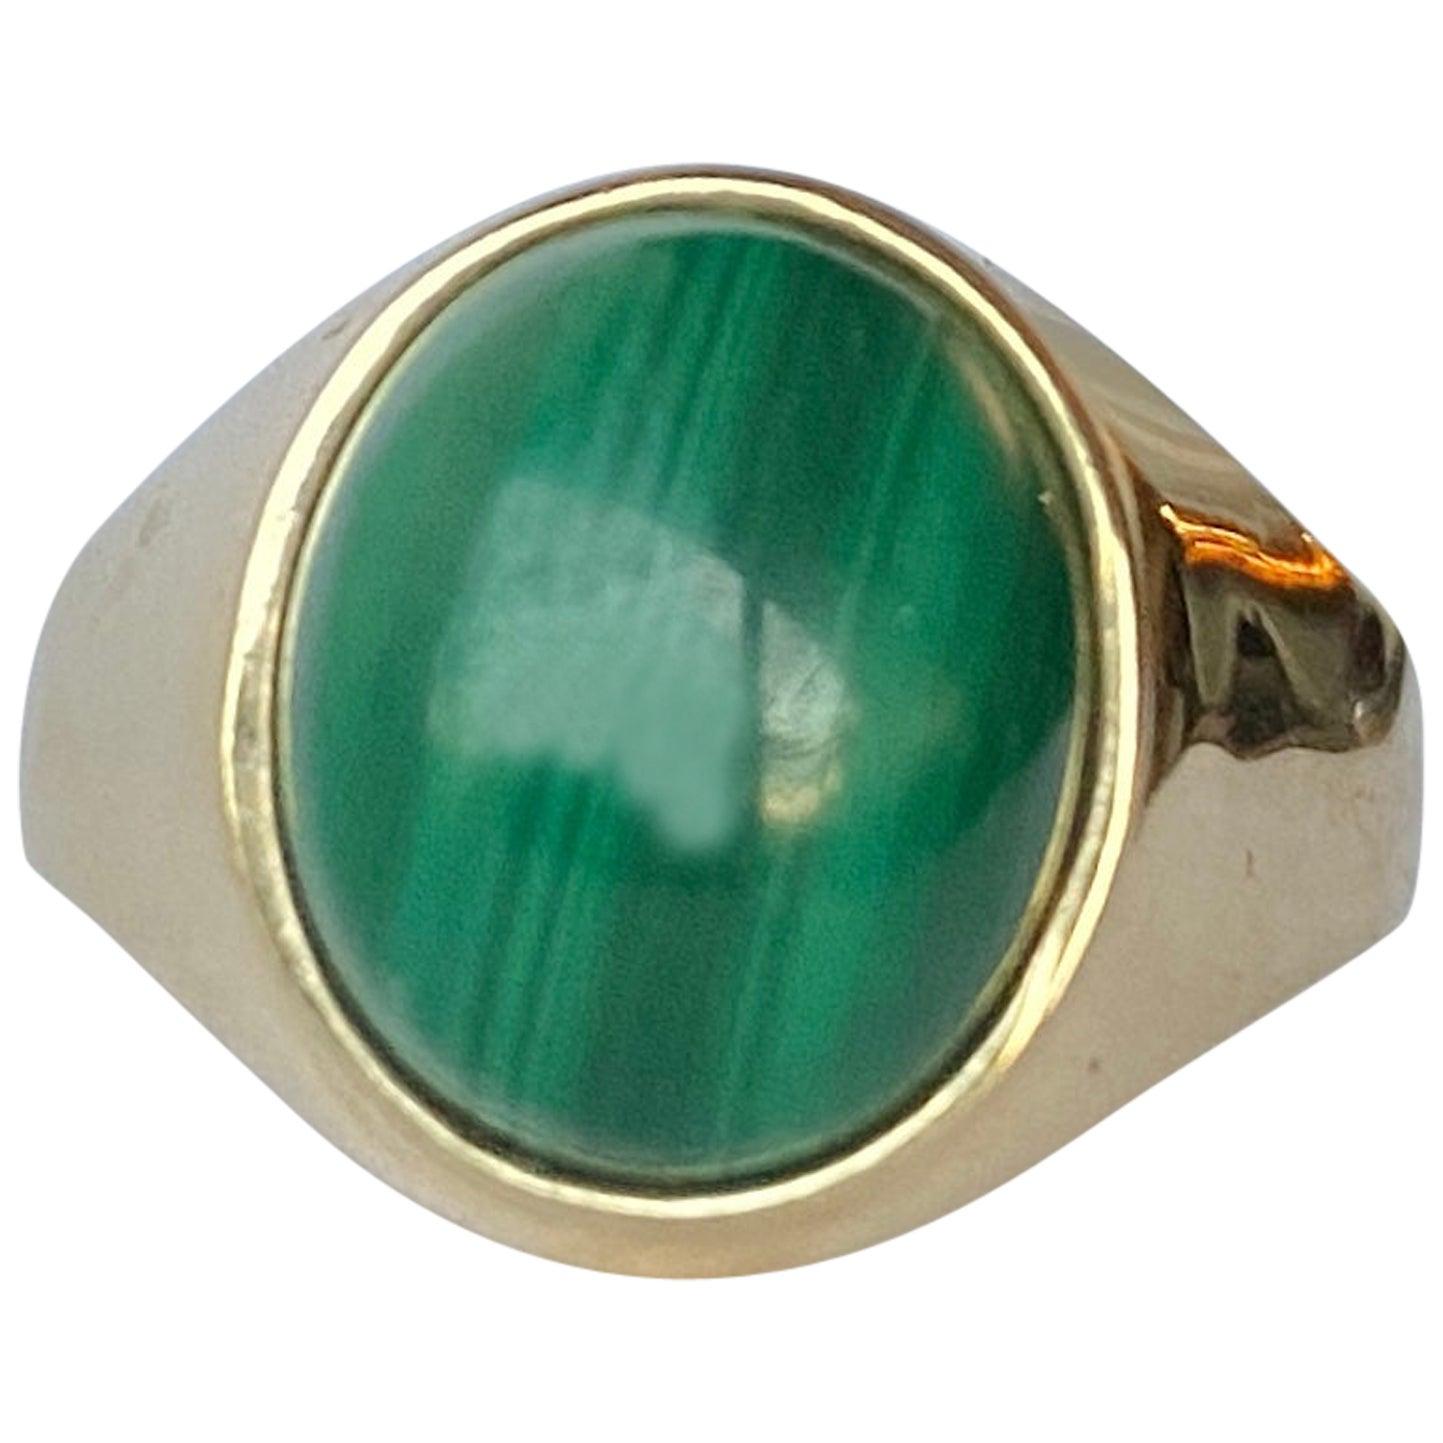 Antique Malachite and 9 Carat Gold Signet Ring